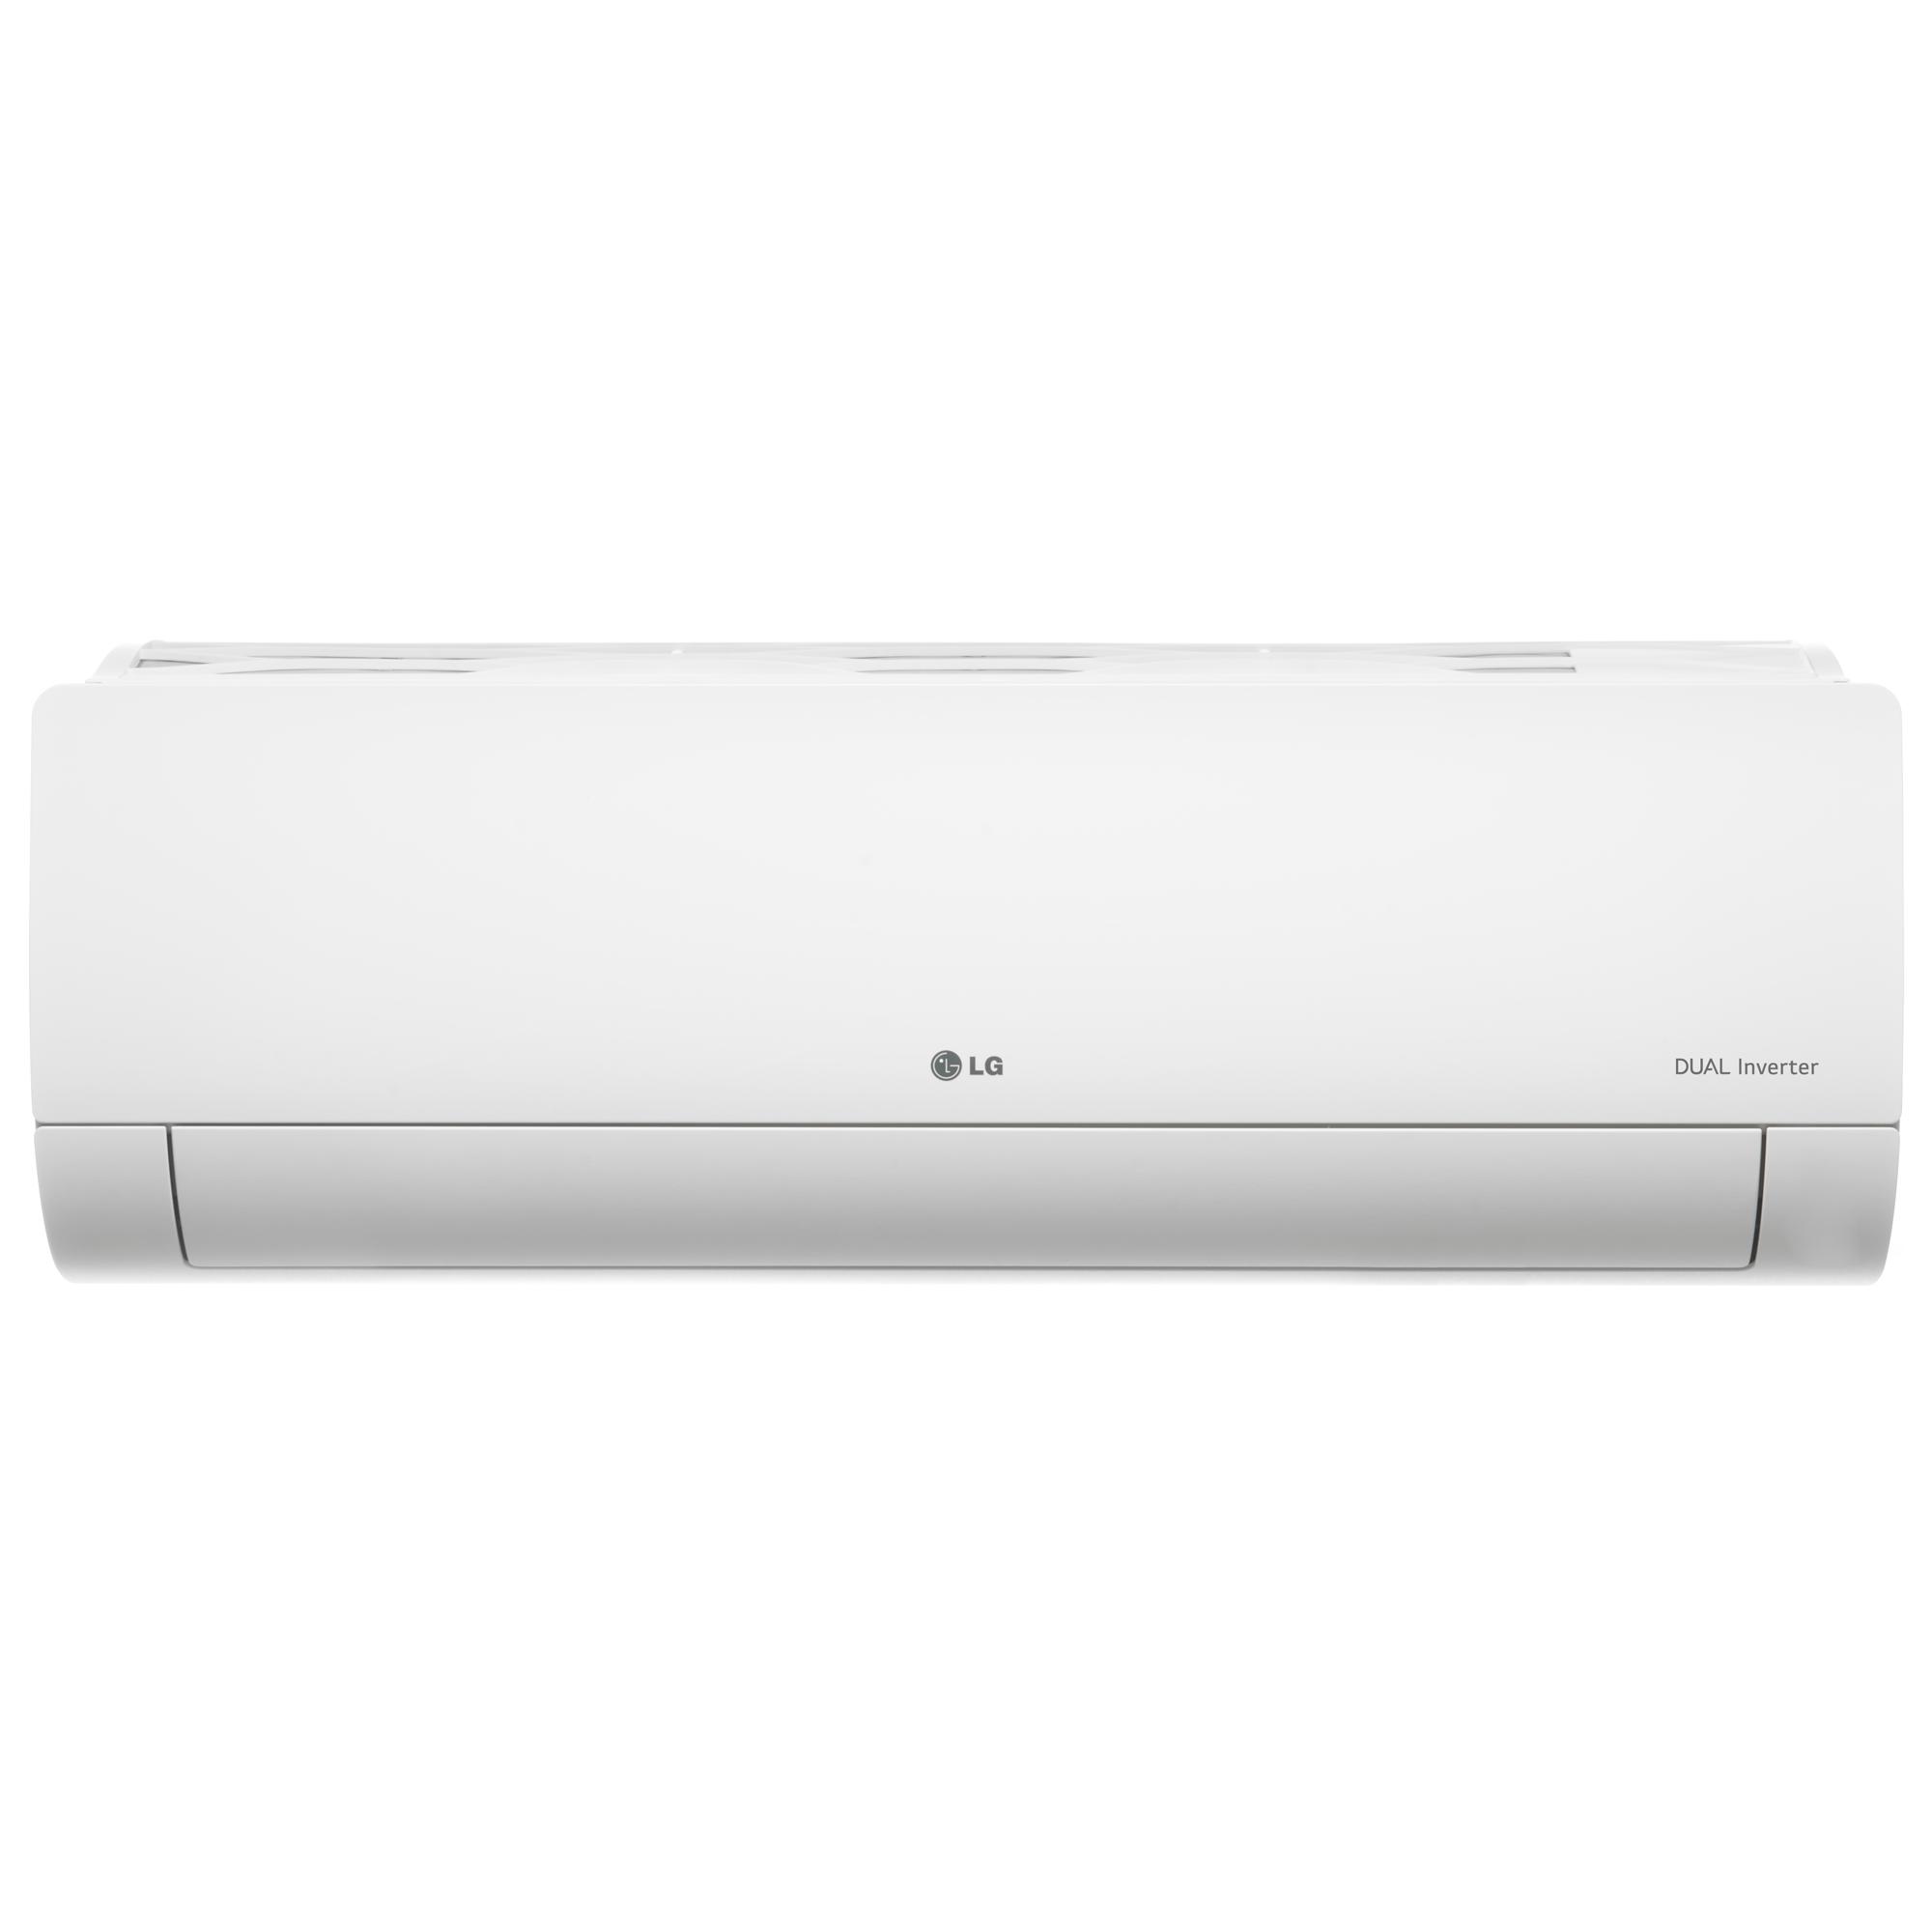 LG 1.5 Ton 3 Star Inverter Split AC (Air Purification Filter, Copper Condenser, MS-Q18UVXA, White)_1